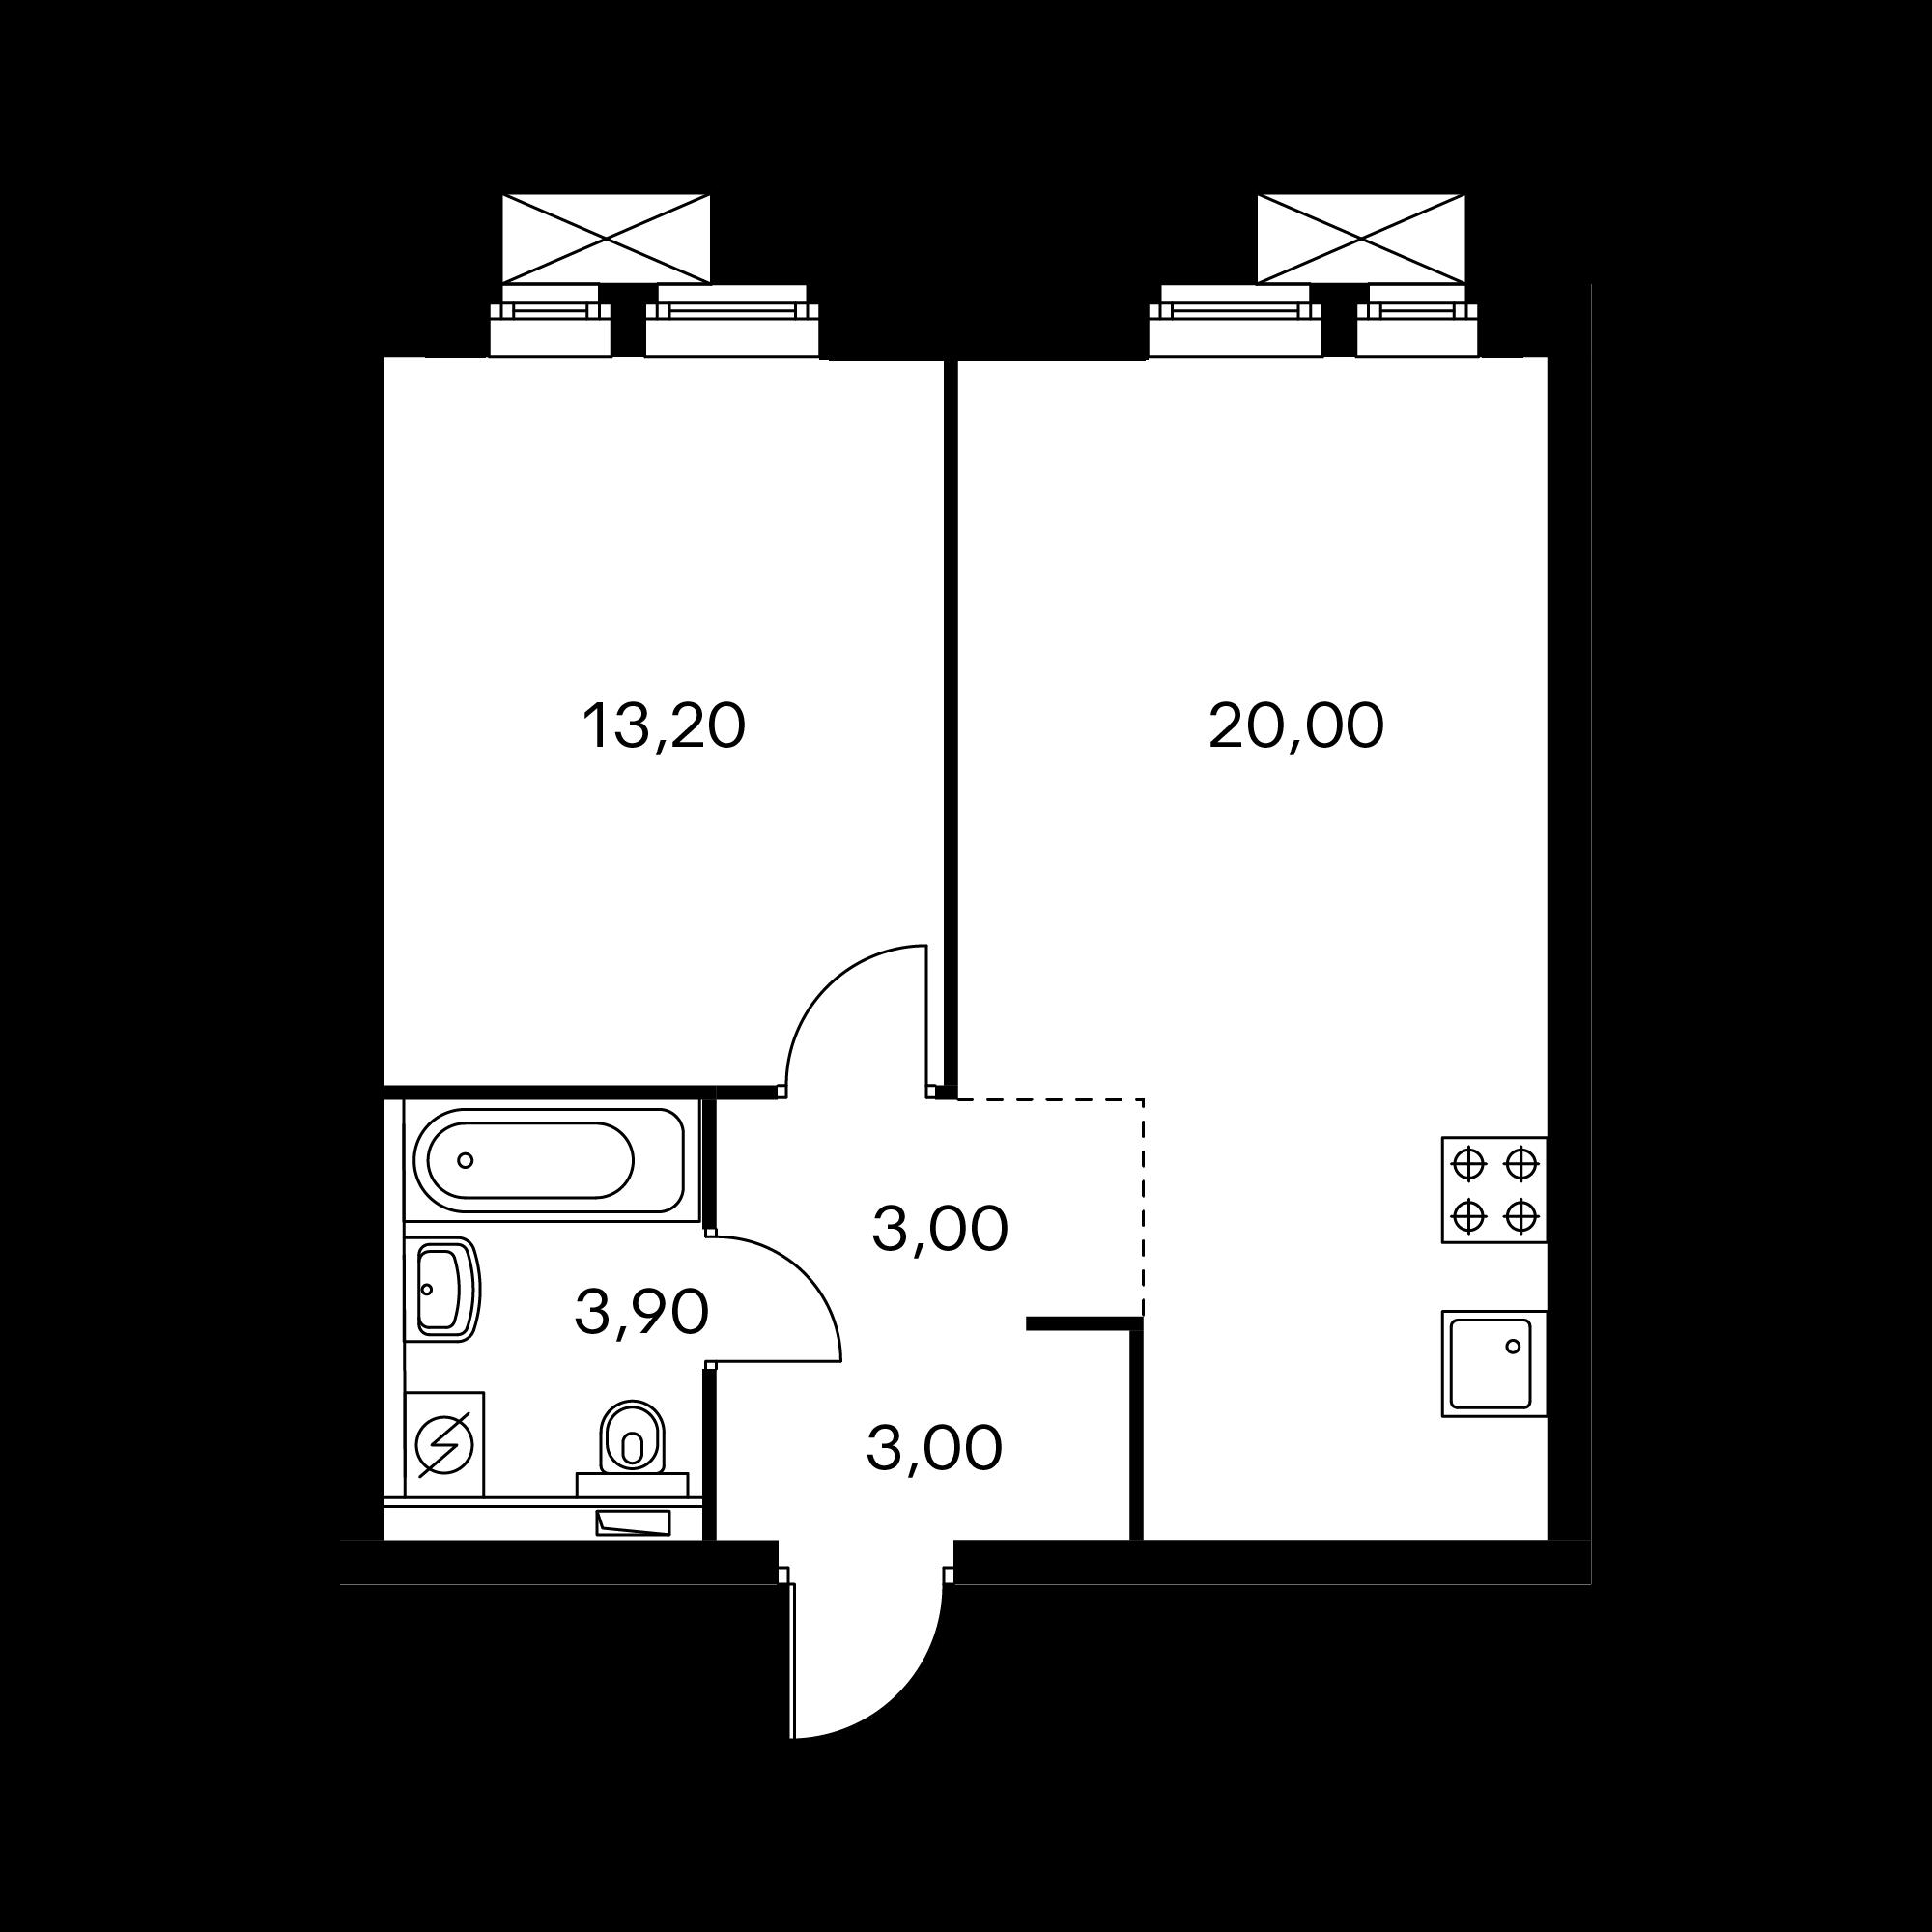 1EL1_6.9-2*